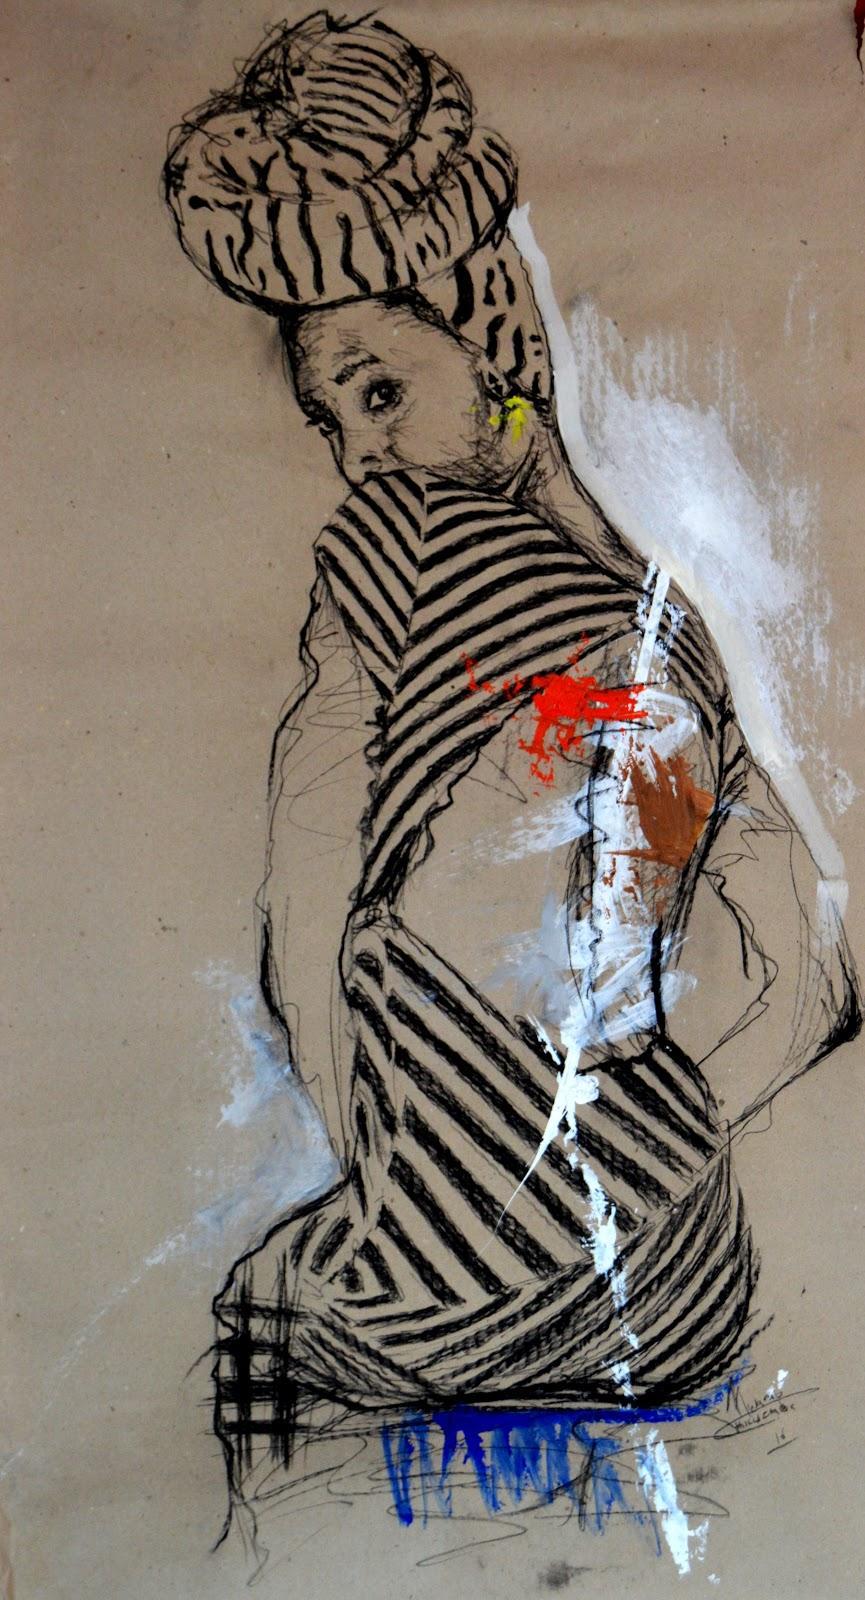 Women's Identity VIII, Mwamba Chikwemba, Female Portrait, Elegant, Drawing